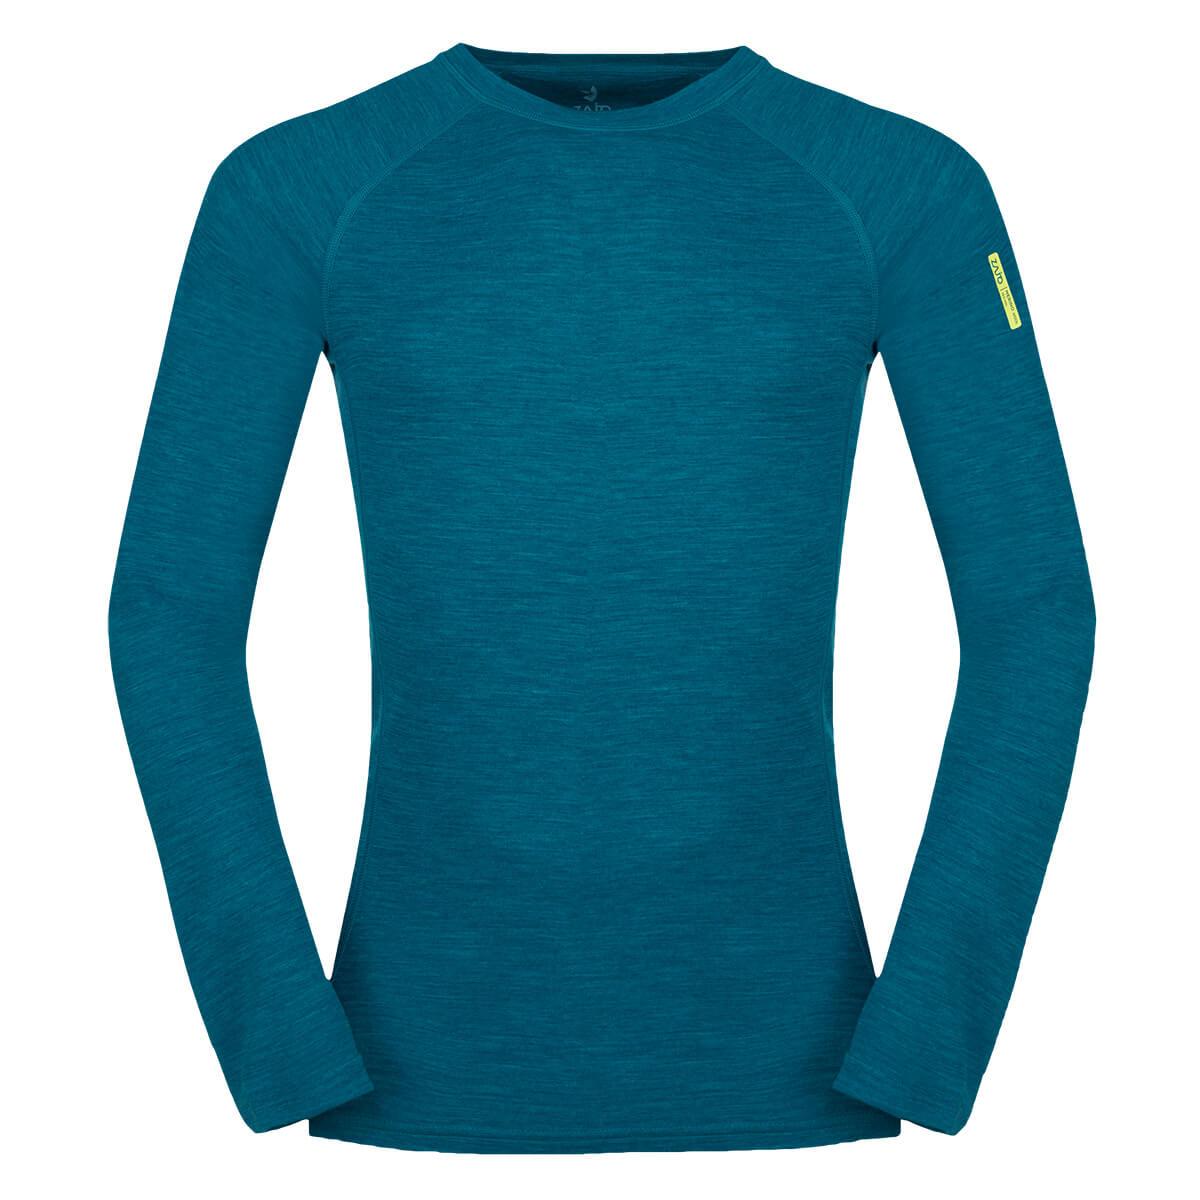 ZAJO Bergen Merino T-shirt LS Deep Lagoon Pánske tričko - veľkosť S